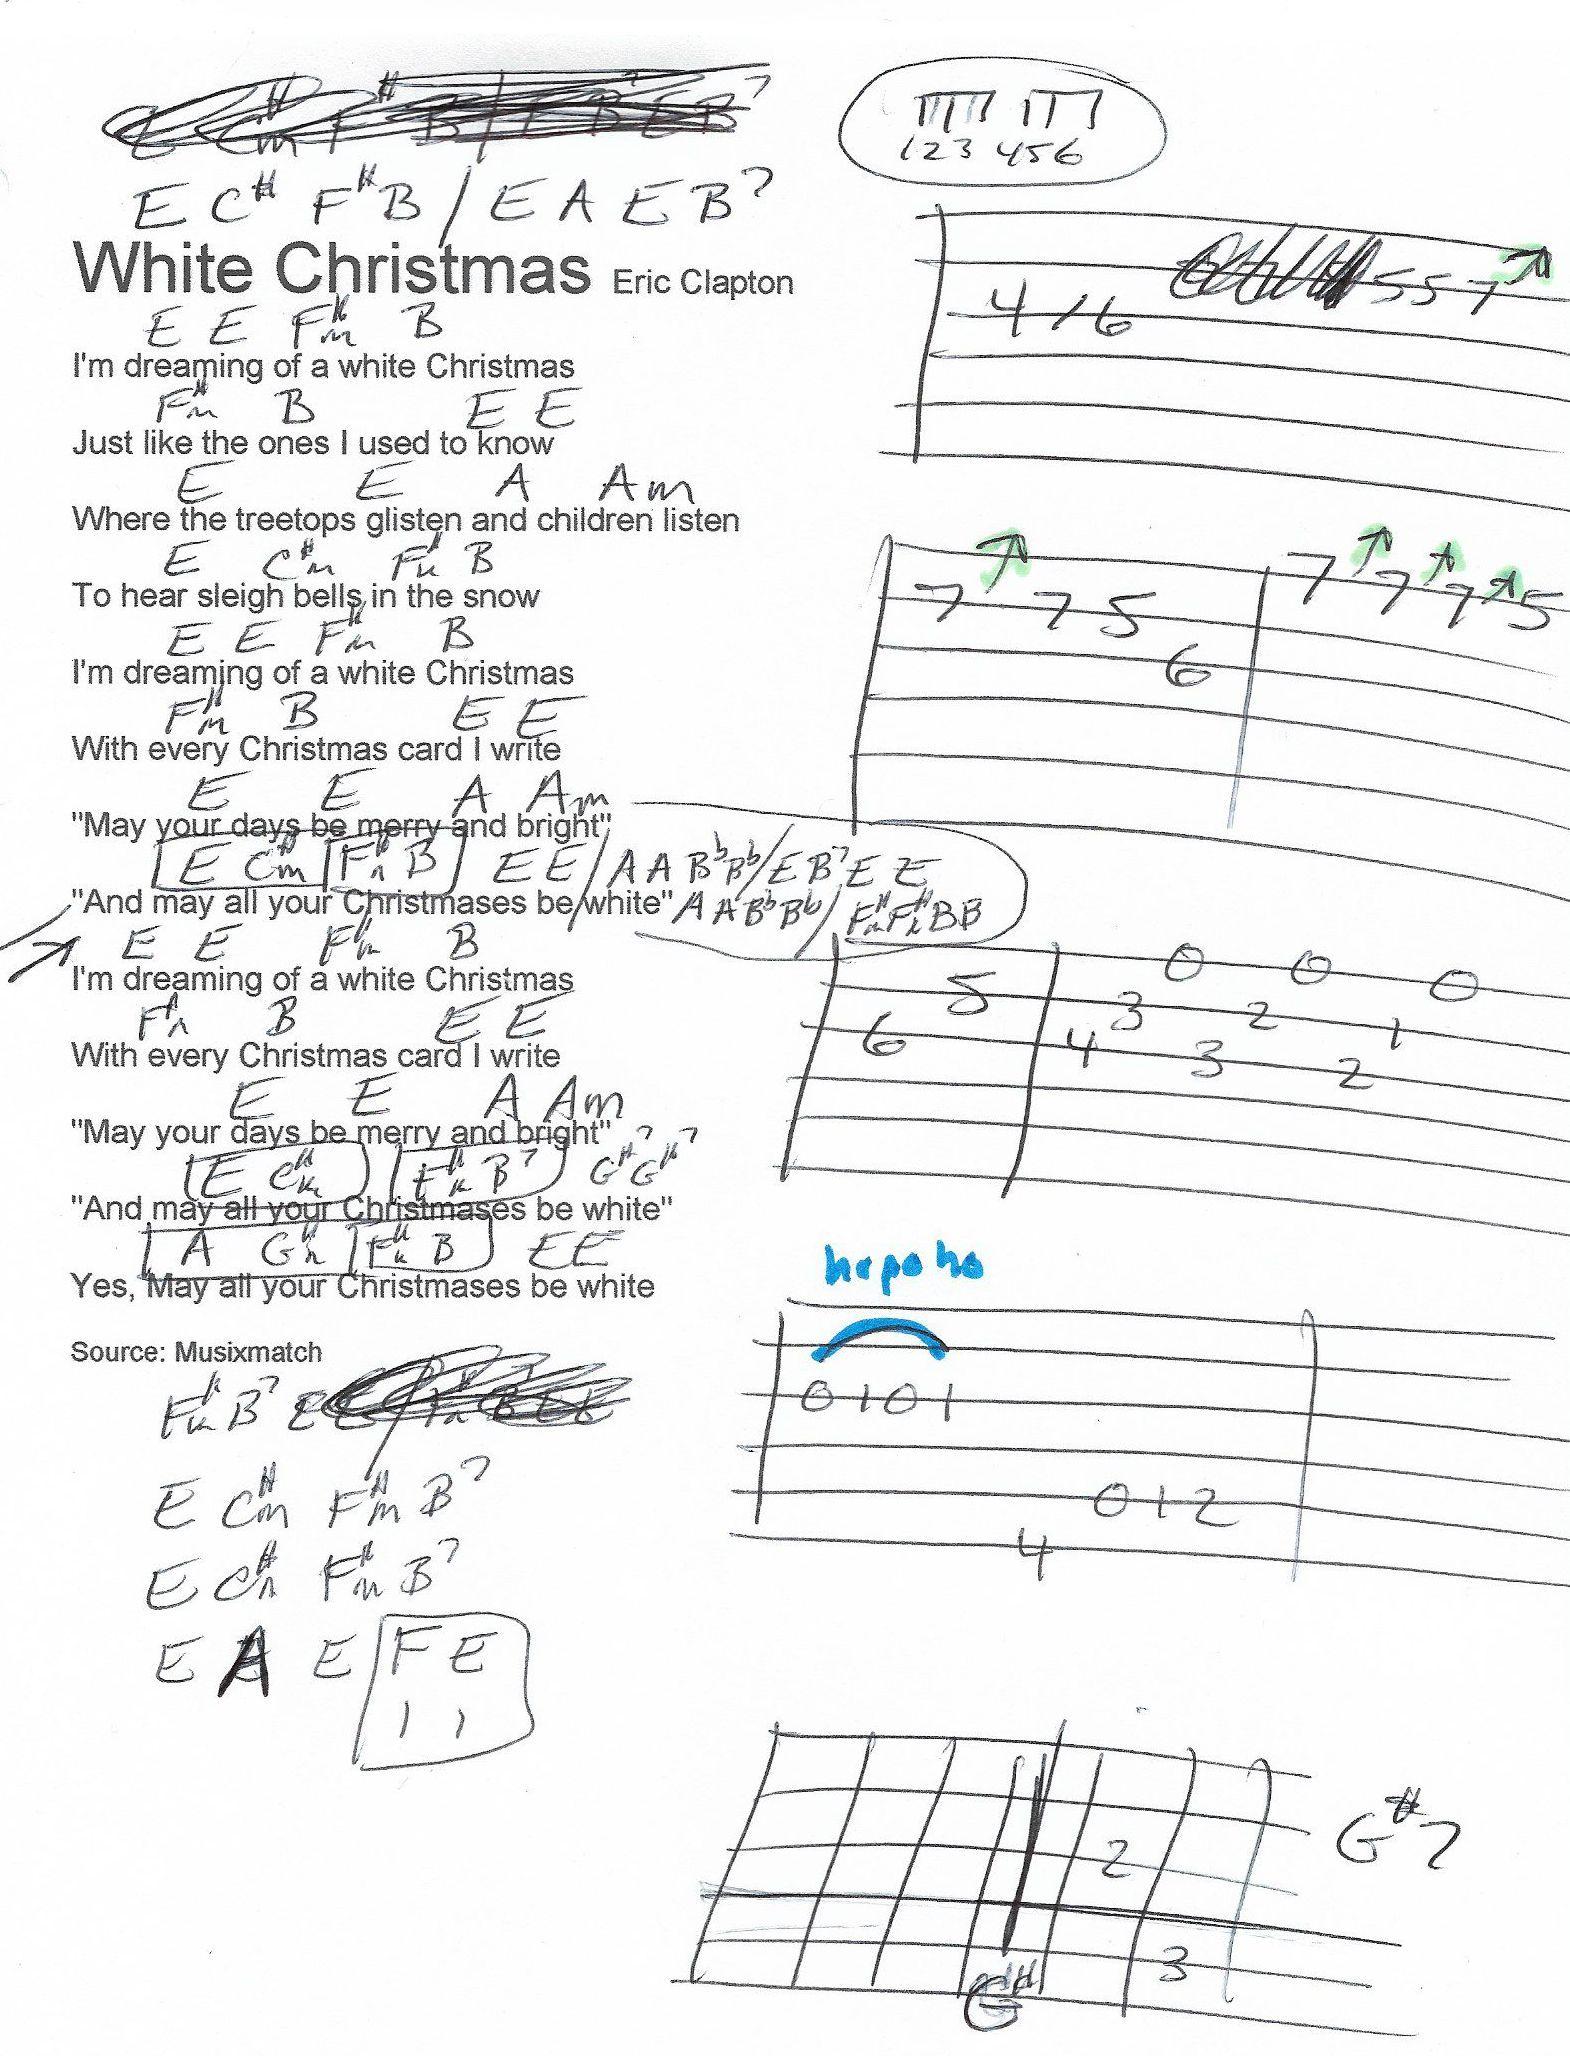 White Christmas (Eric Clapton) Guitar Chord Chart Guitar